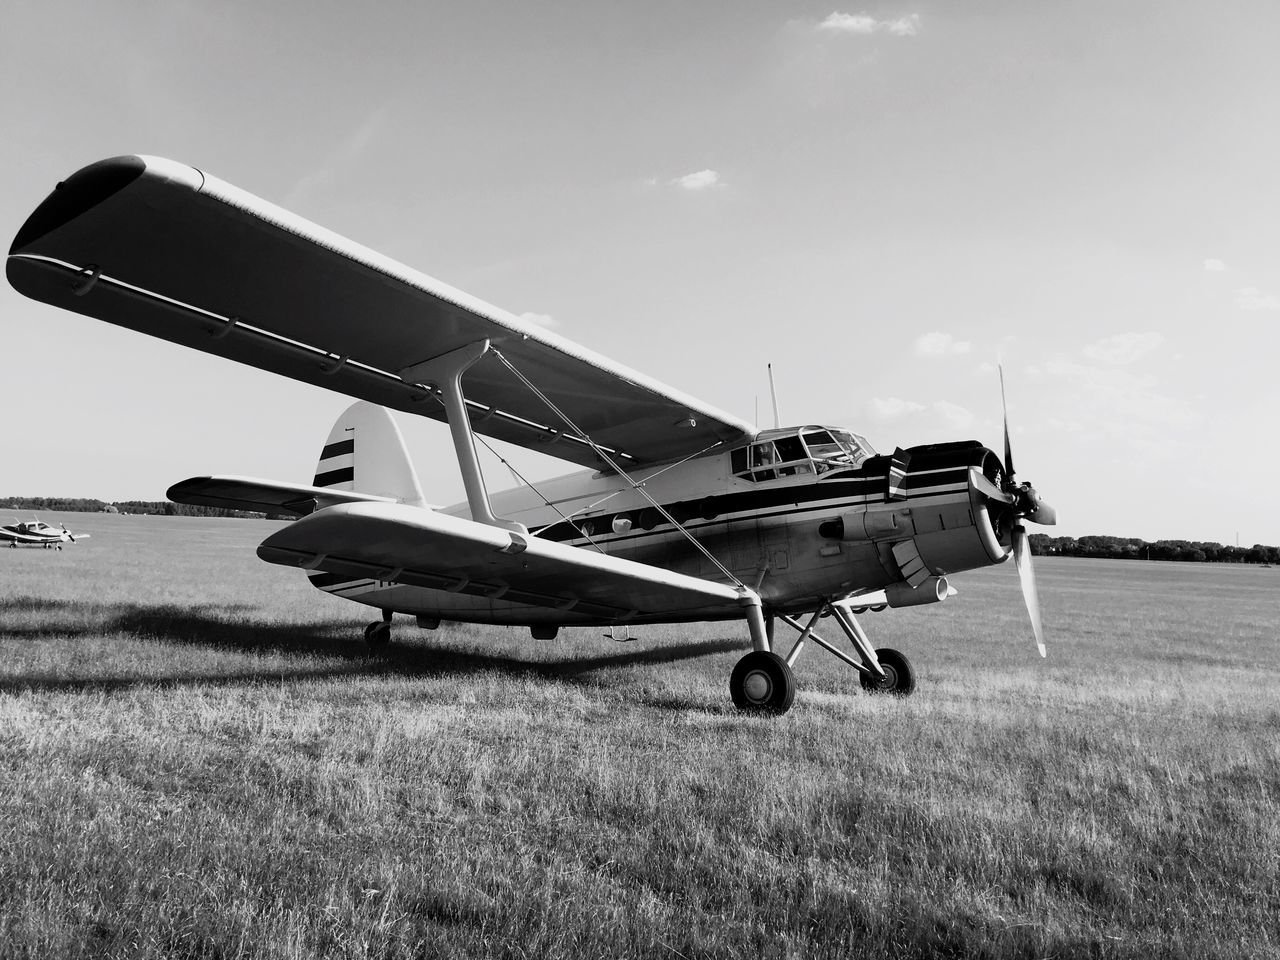 An old AN-2 airplane.